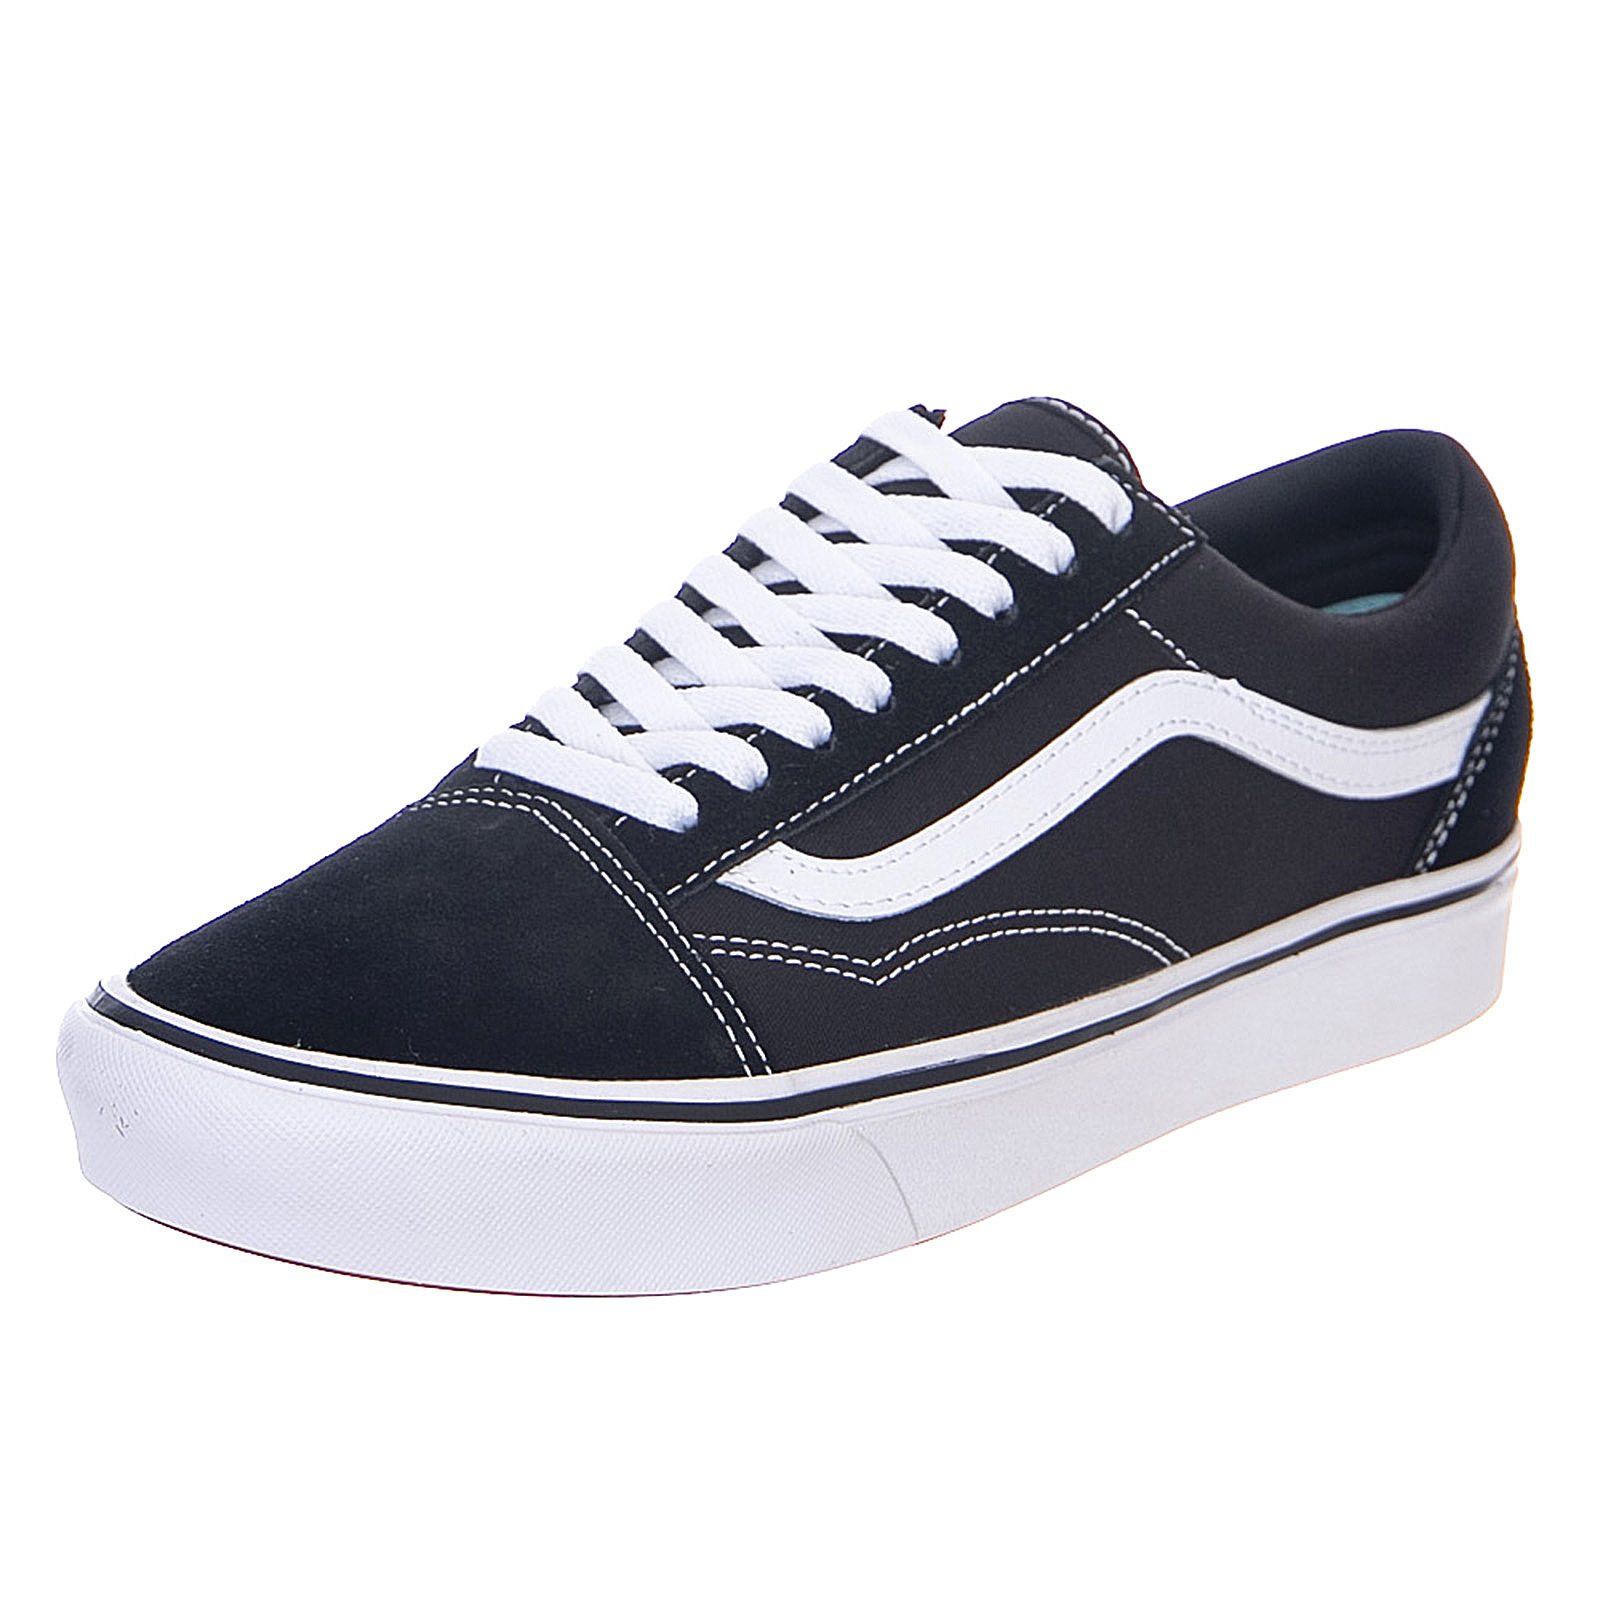 Détails sur Vans Comfy Cush Old Skool BlackTrue White Sneakers Stringate Uomo Nero